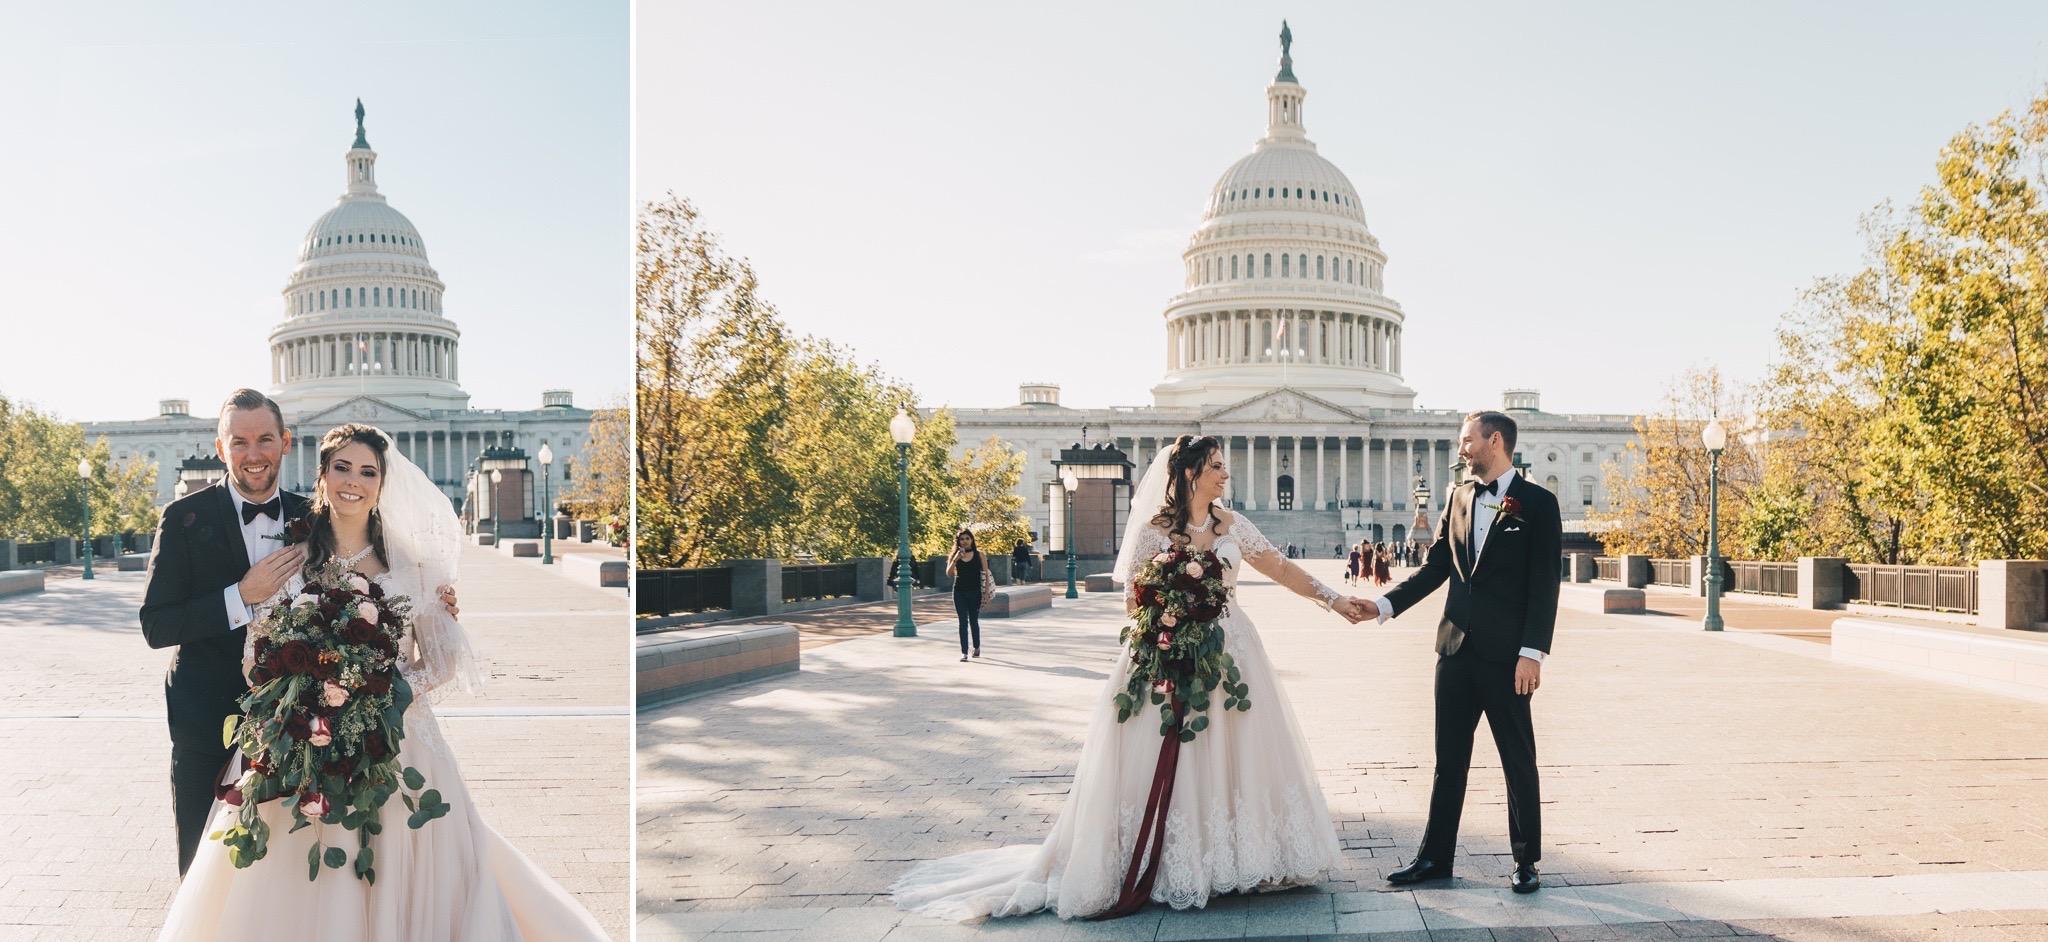 Nathan Elaina Romantic Capitol Wedding in Washington DC by Jonathan Hannah Photography6.jpg